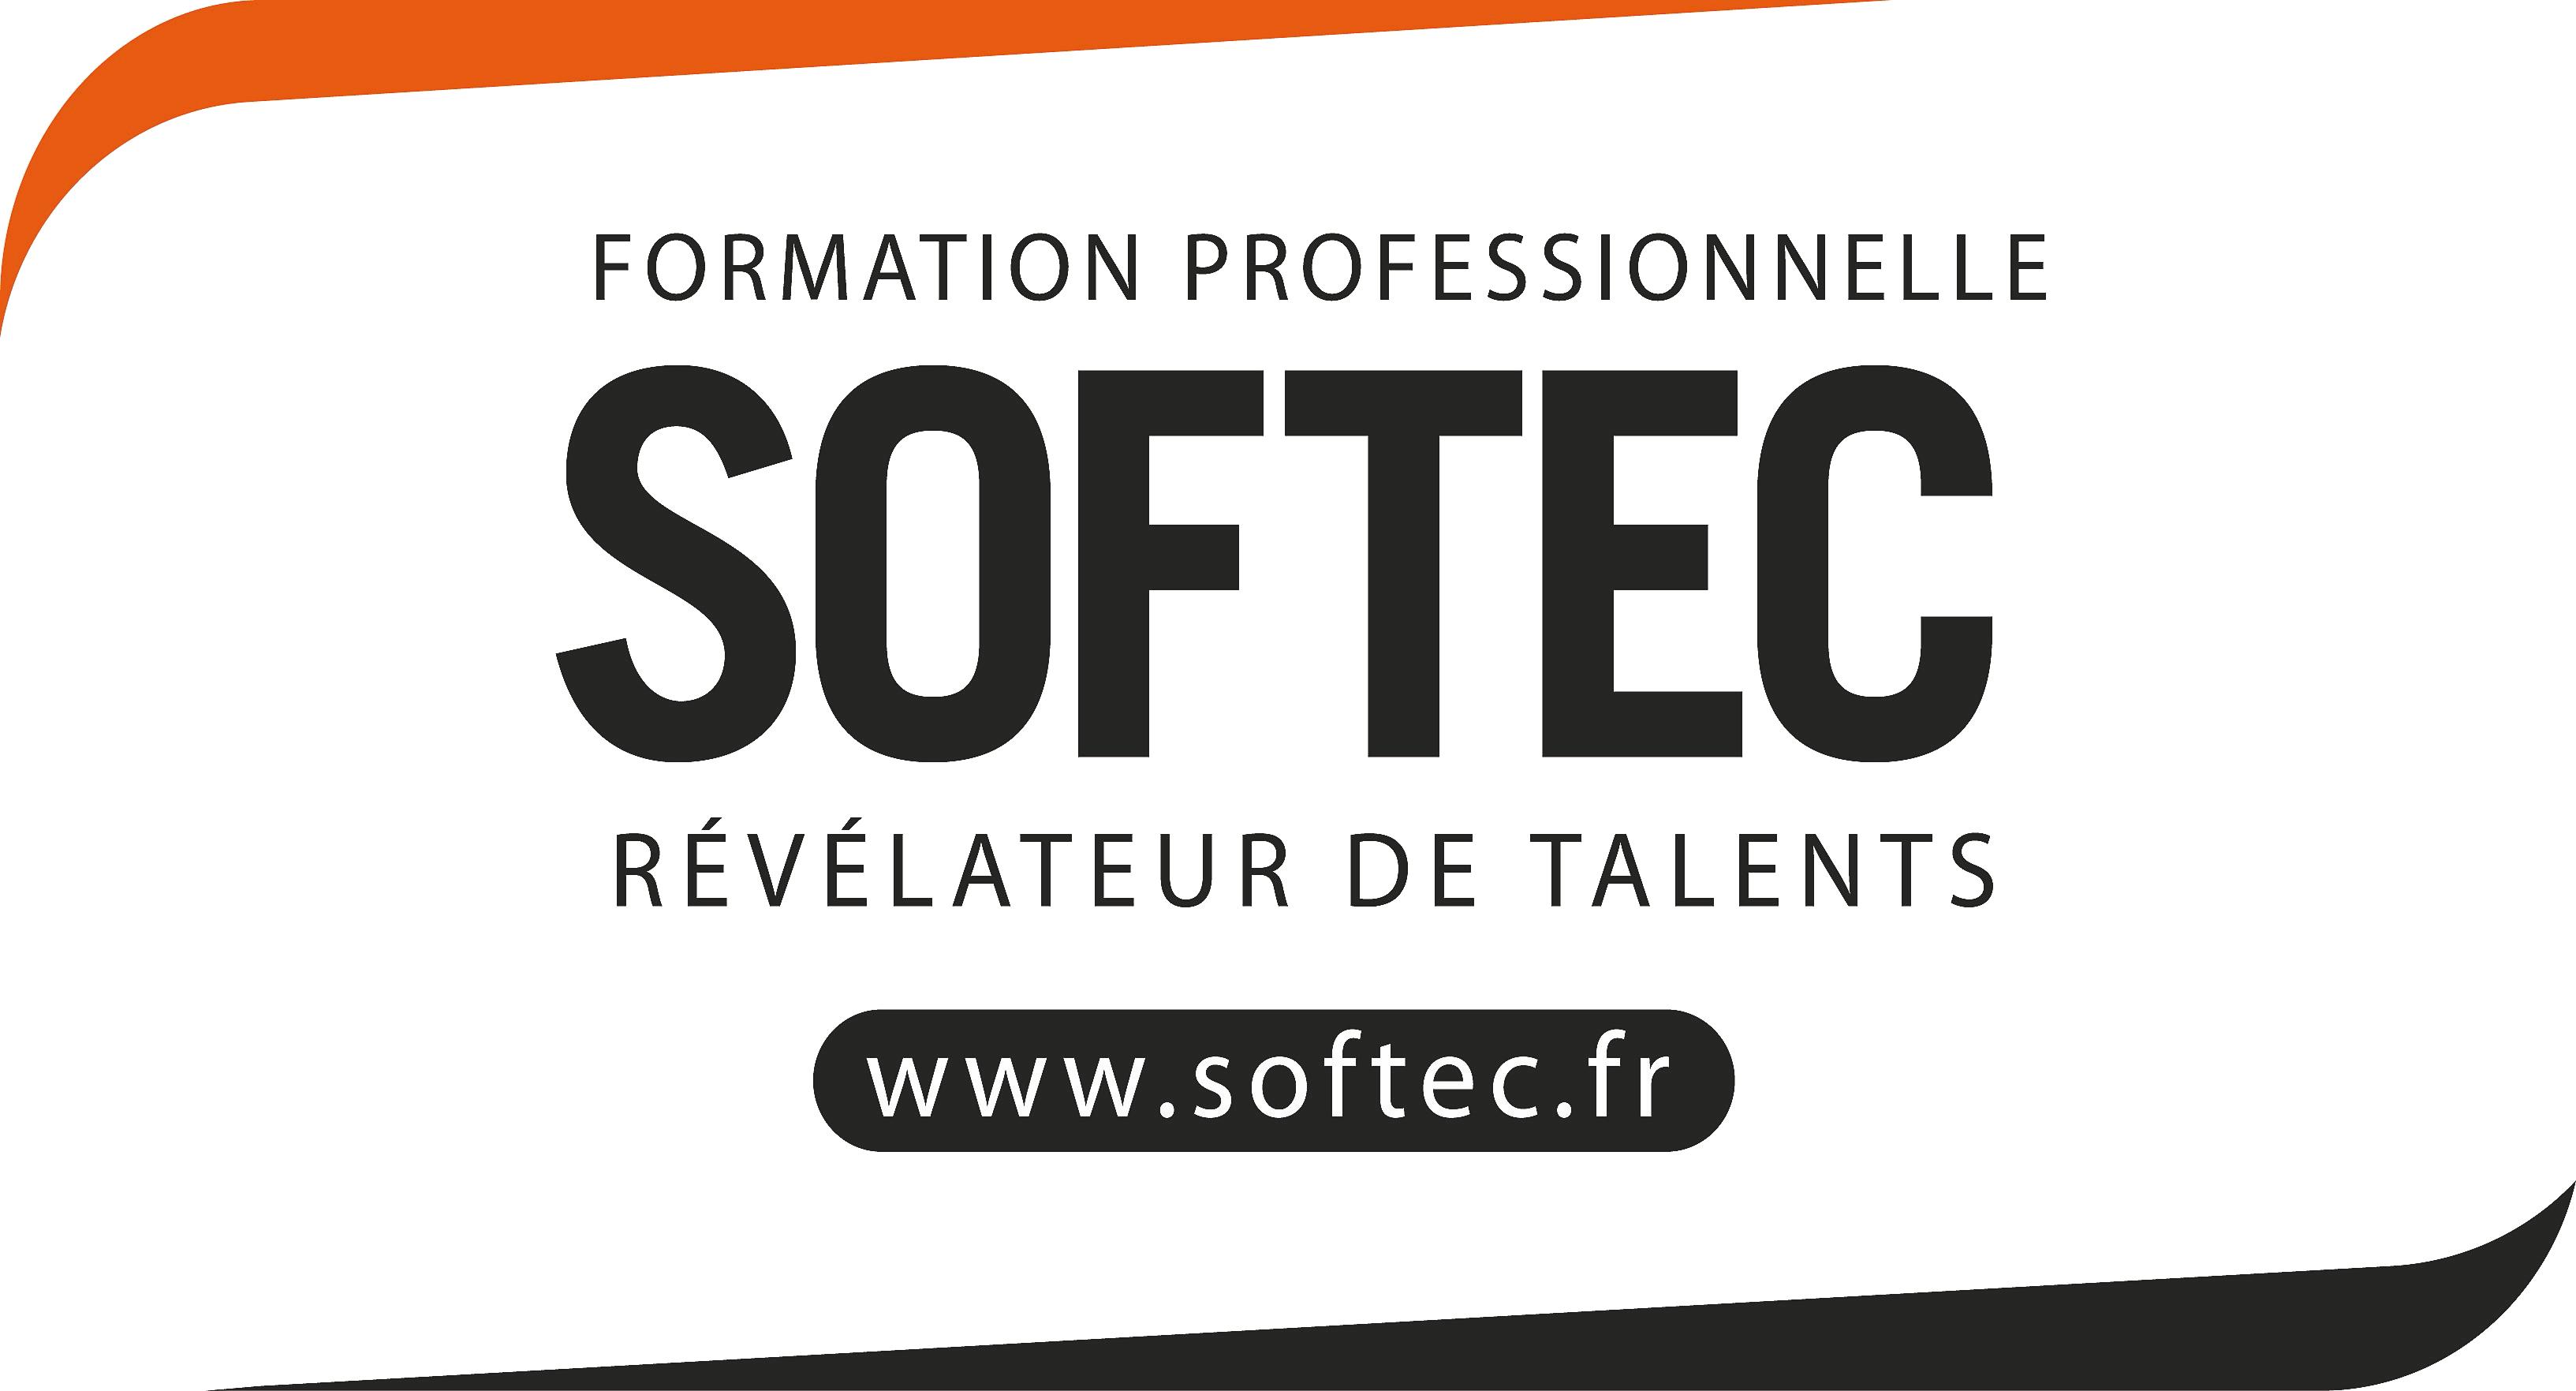 SOFTEC logo